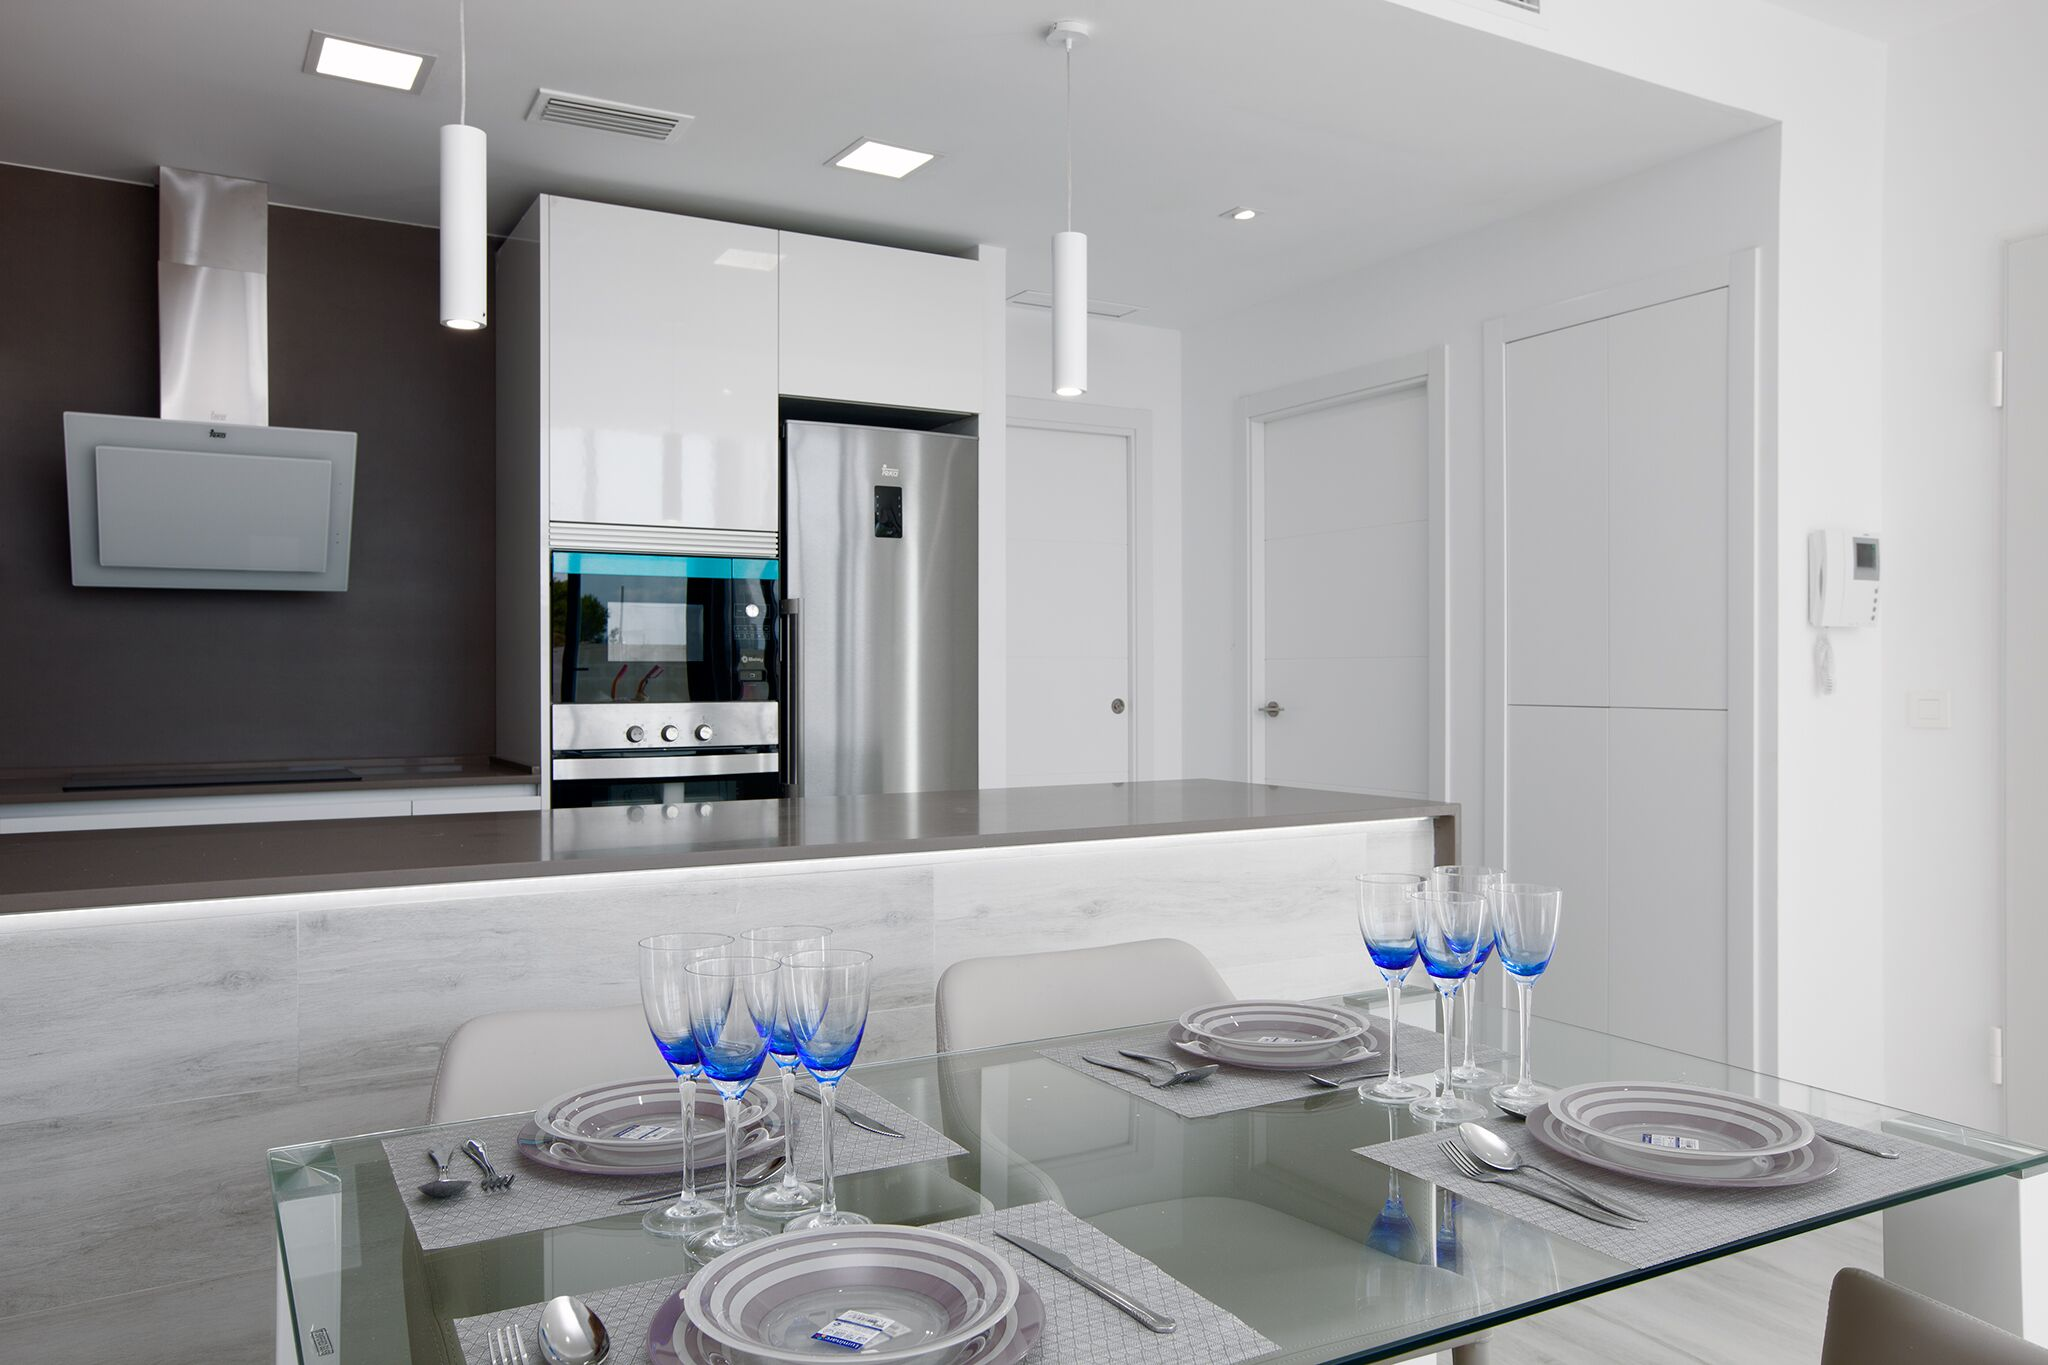 kf943102: Villa for sale in Cabo Roig